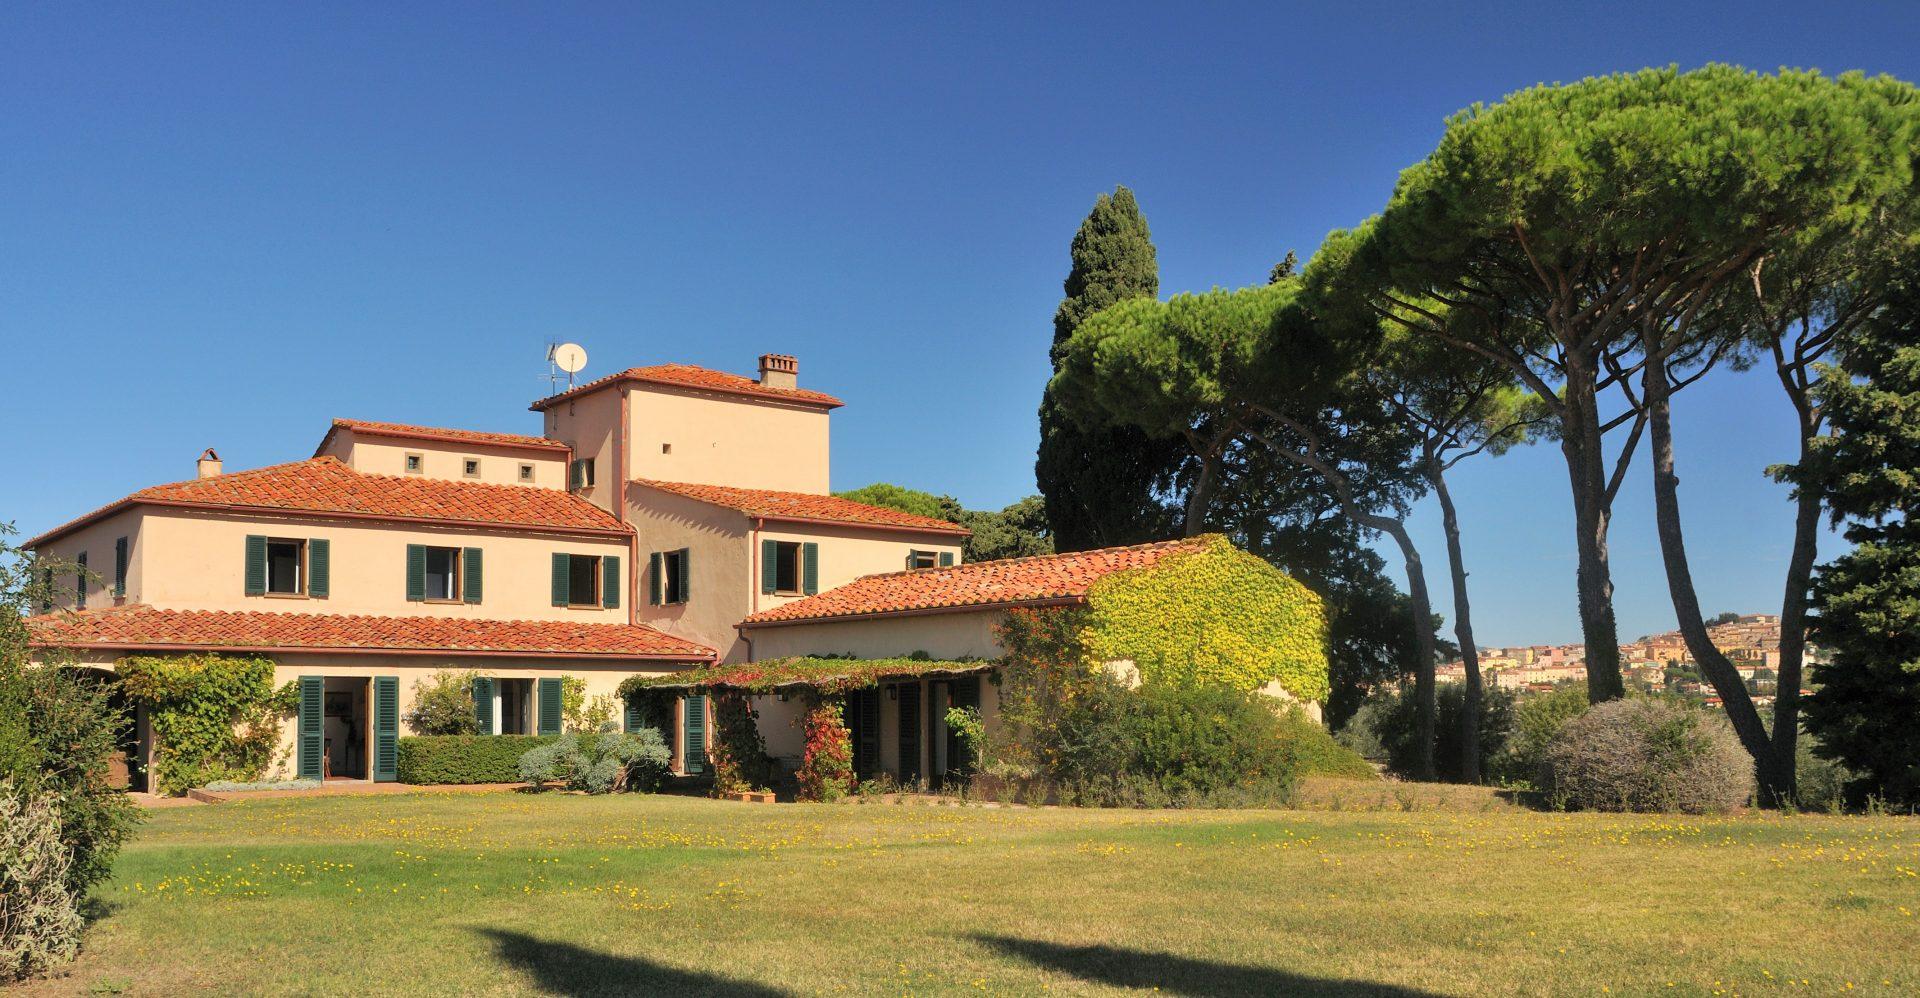 Villa Gherardesca, Maremma, Tuscany